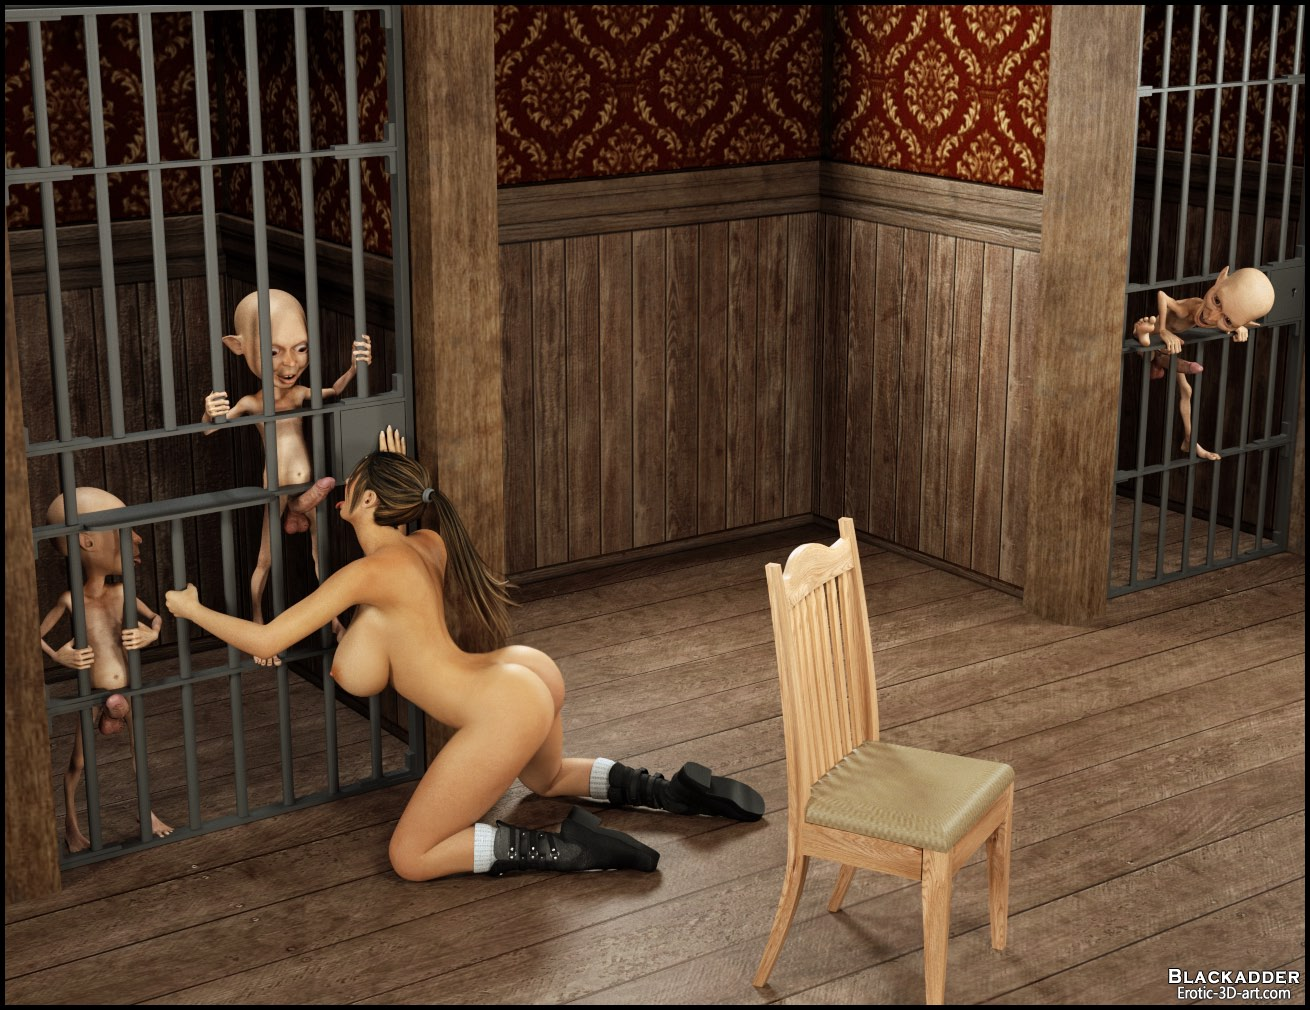 Narod tomb raider porn sluts smut clips